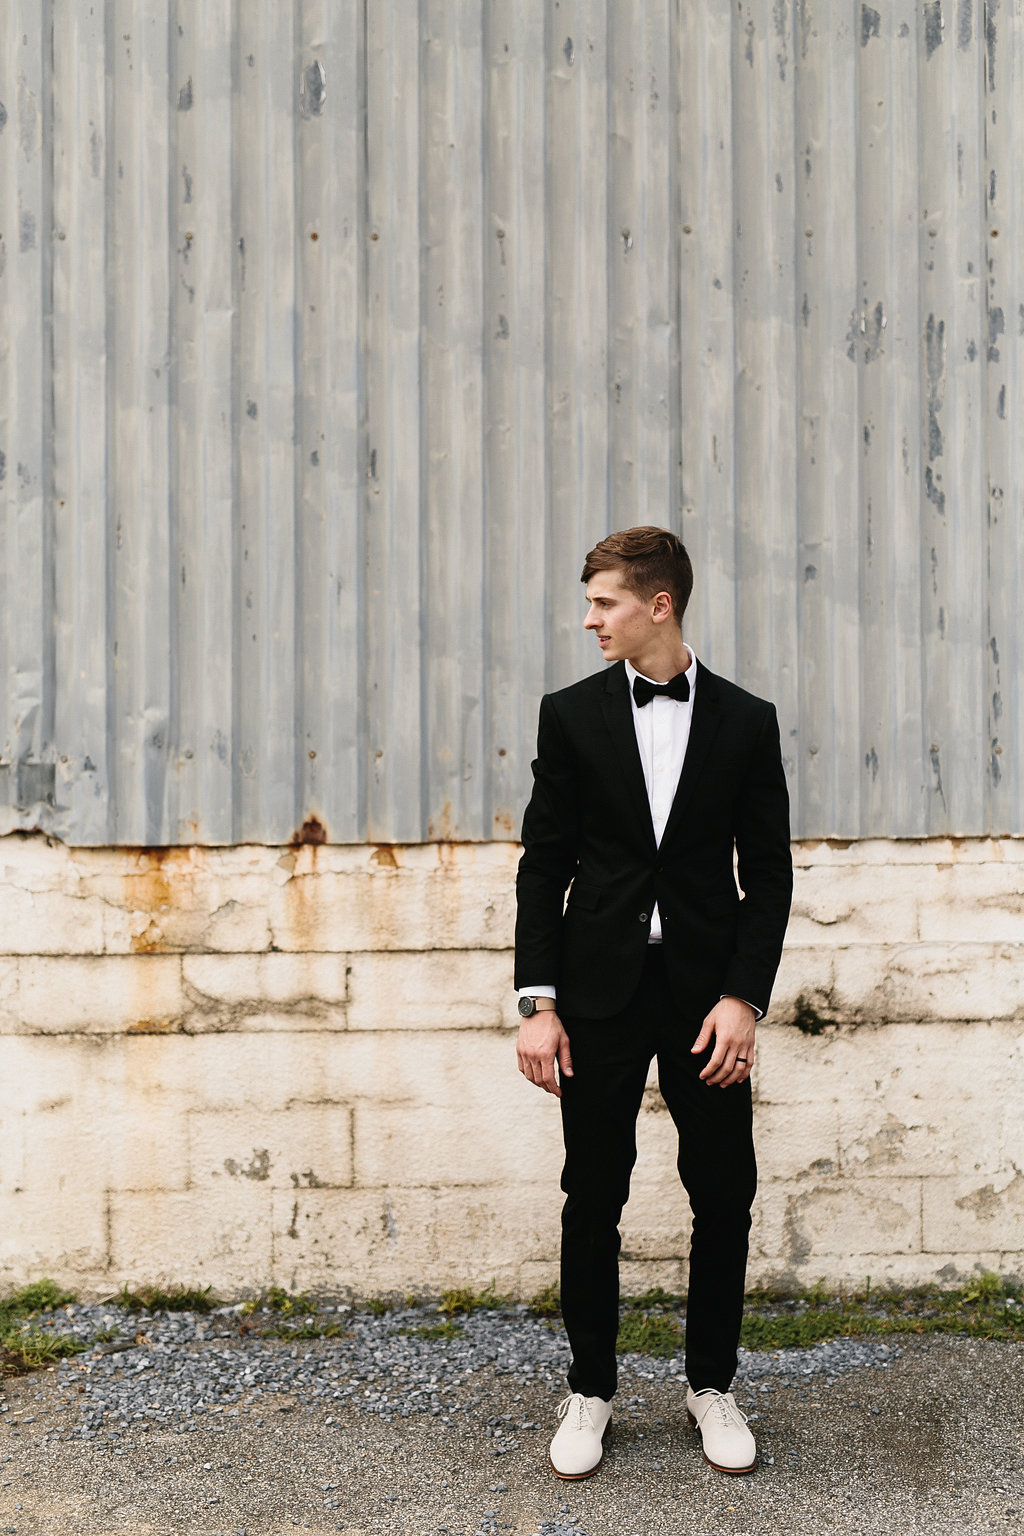 justin&emily-wedding-488.jpg